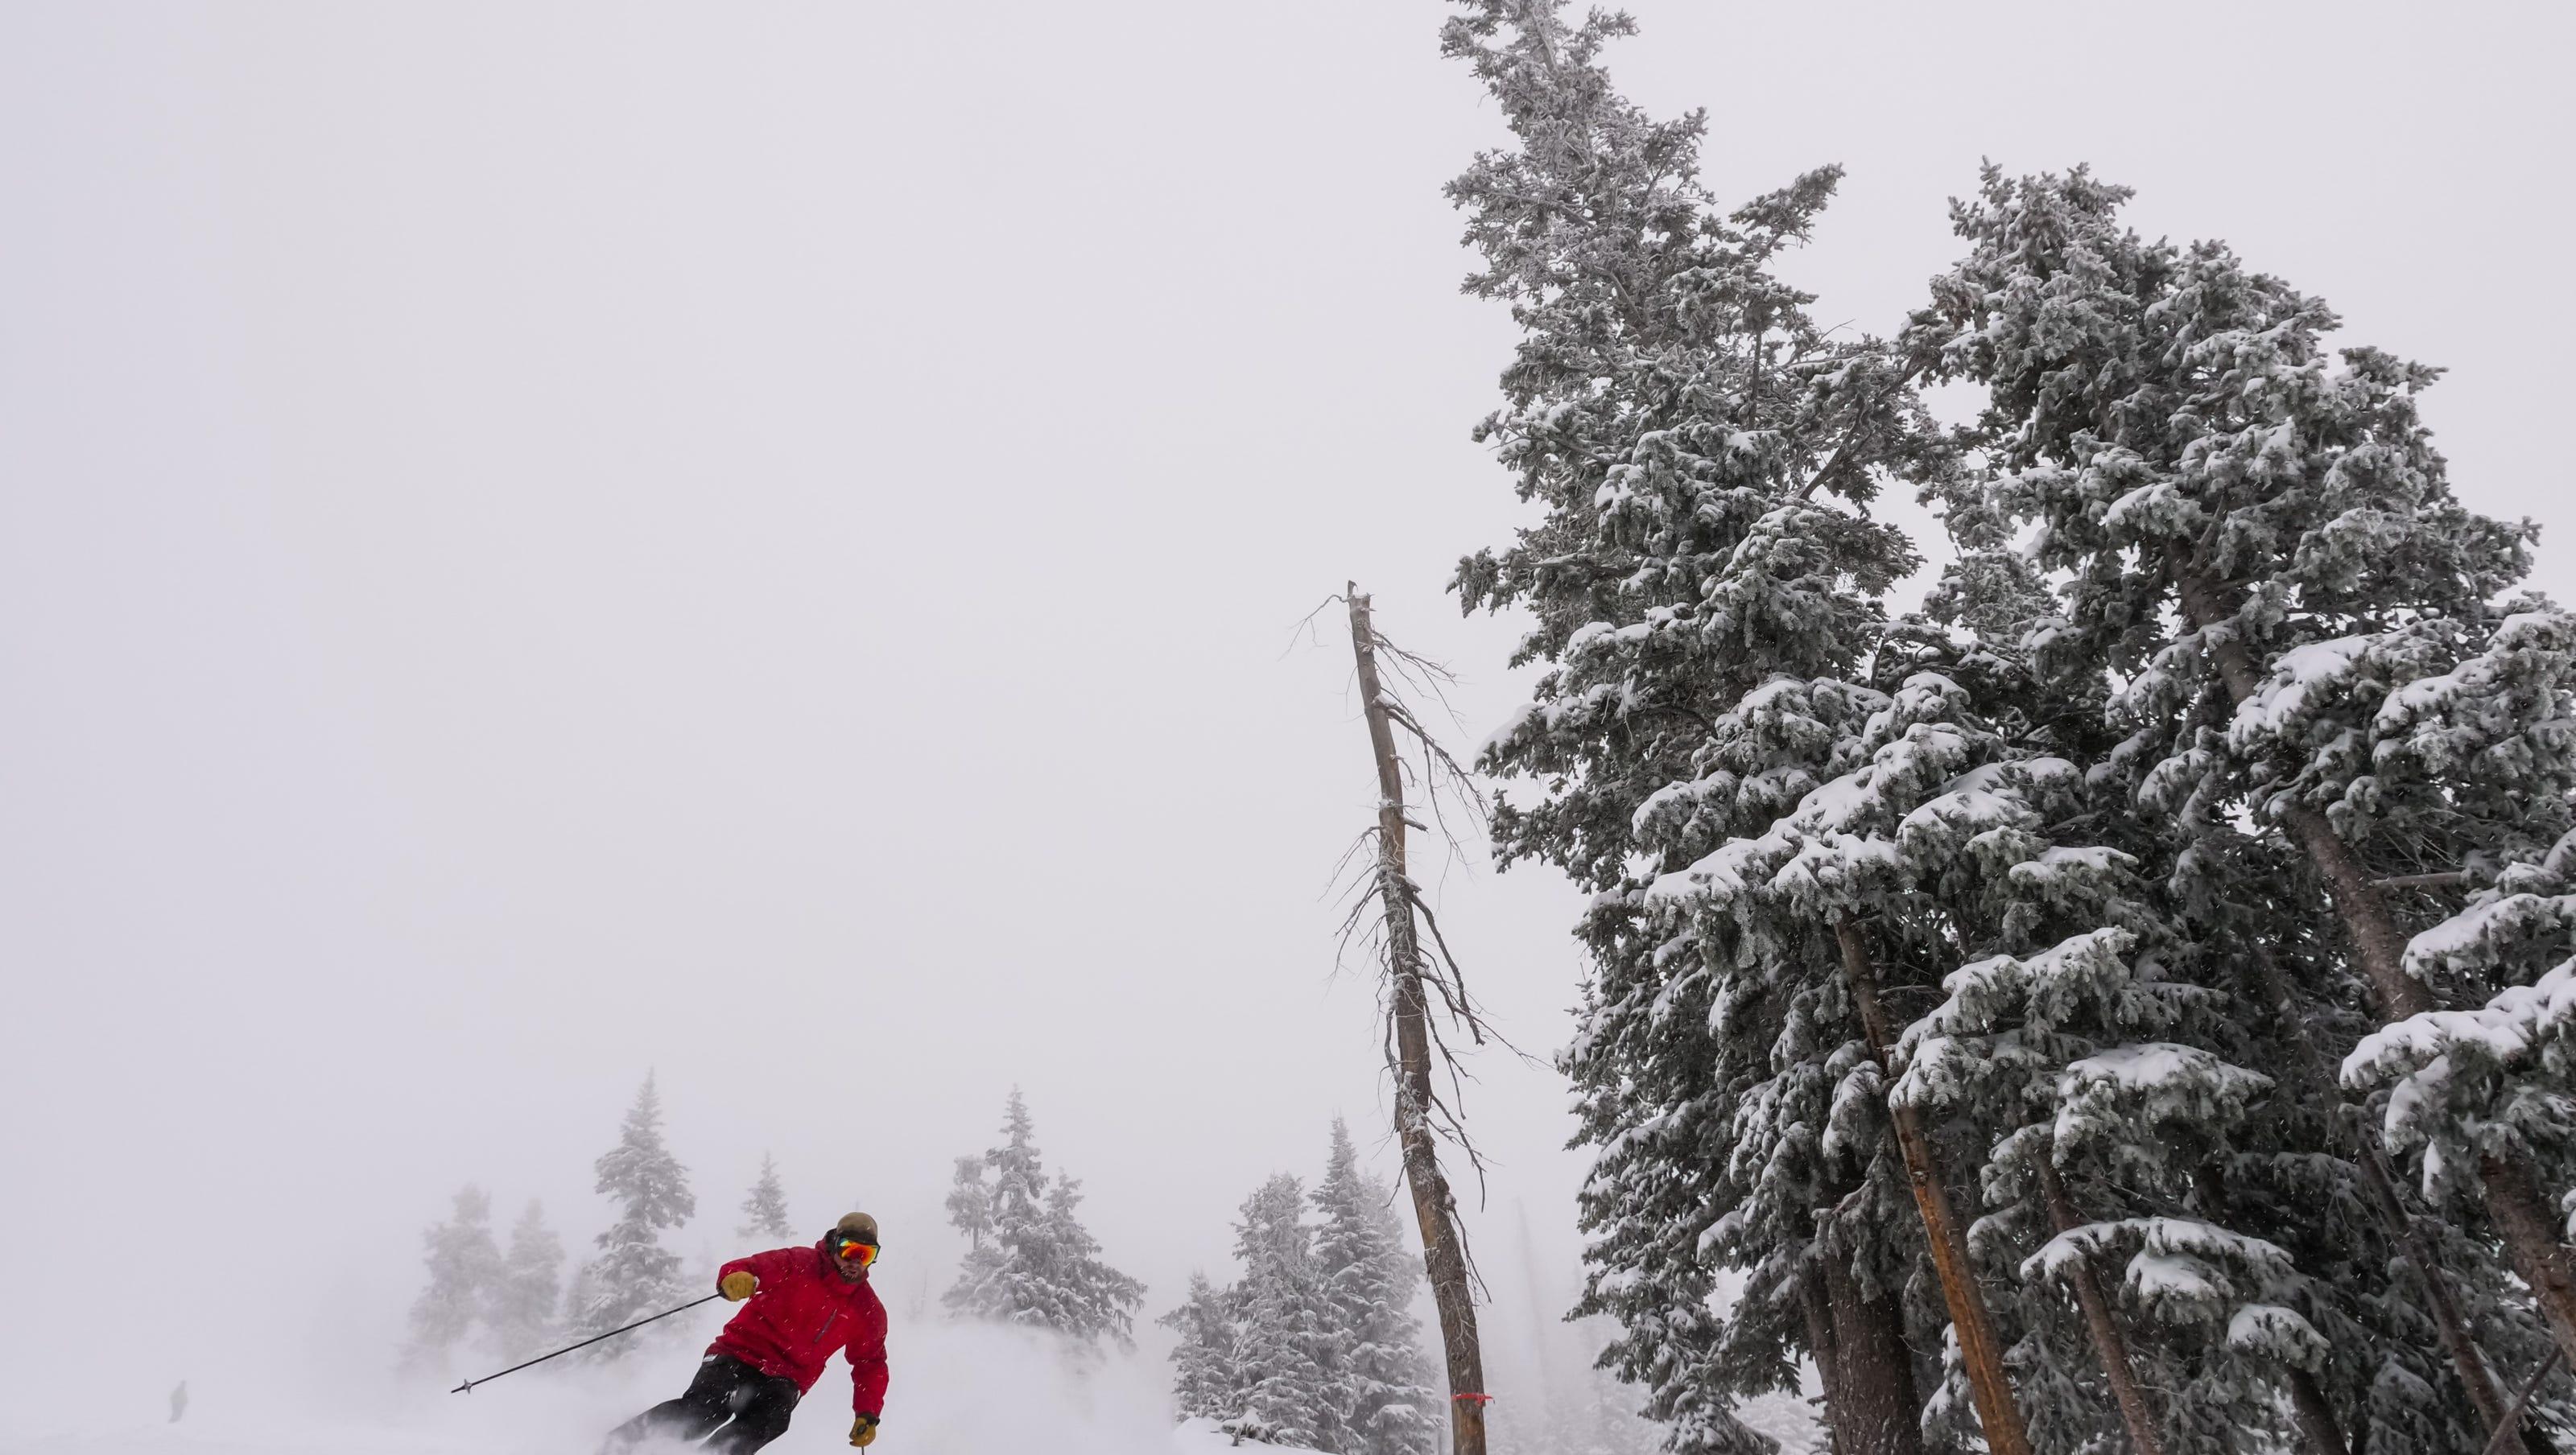 arizona ski report: flagstaff, sunrise park are open